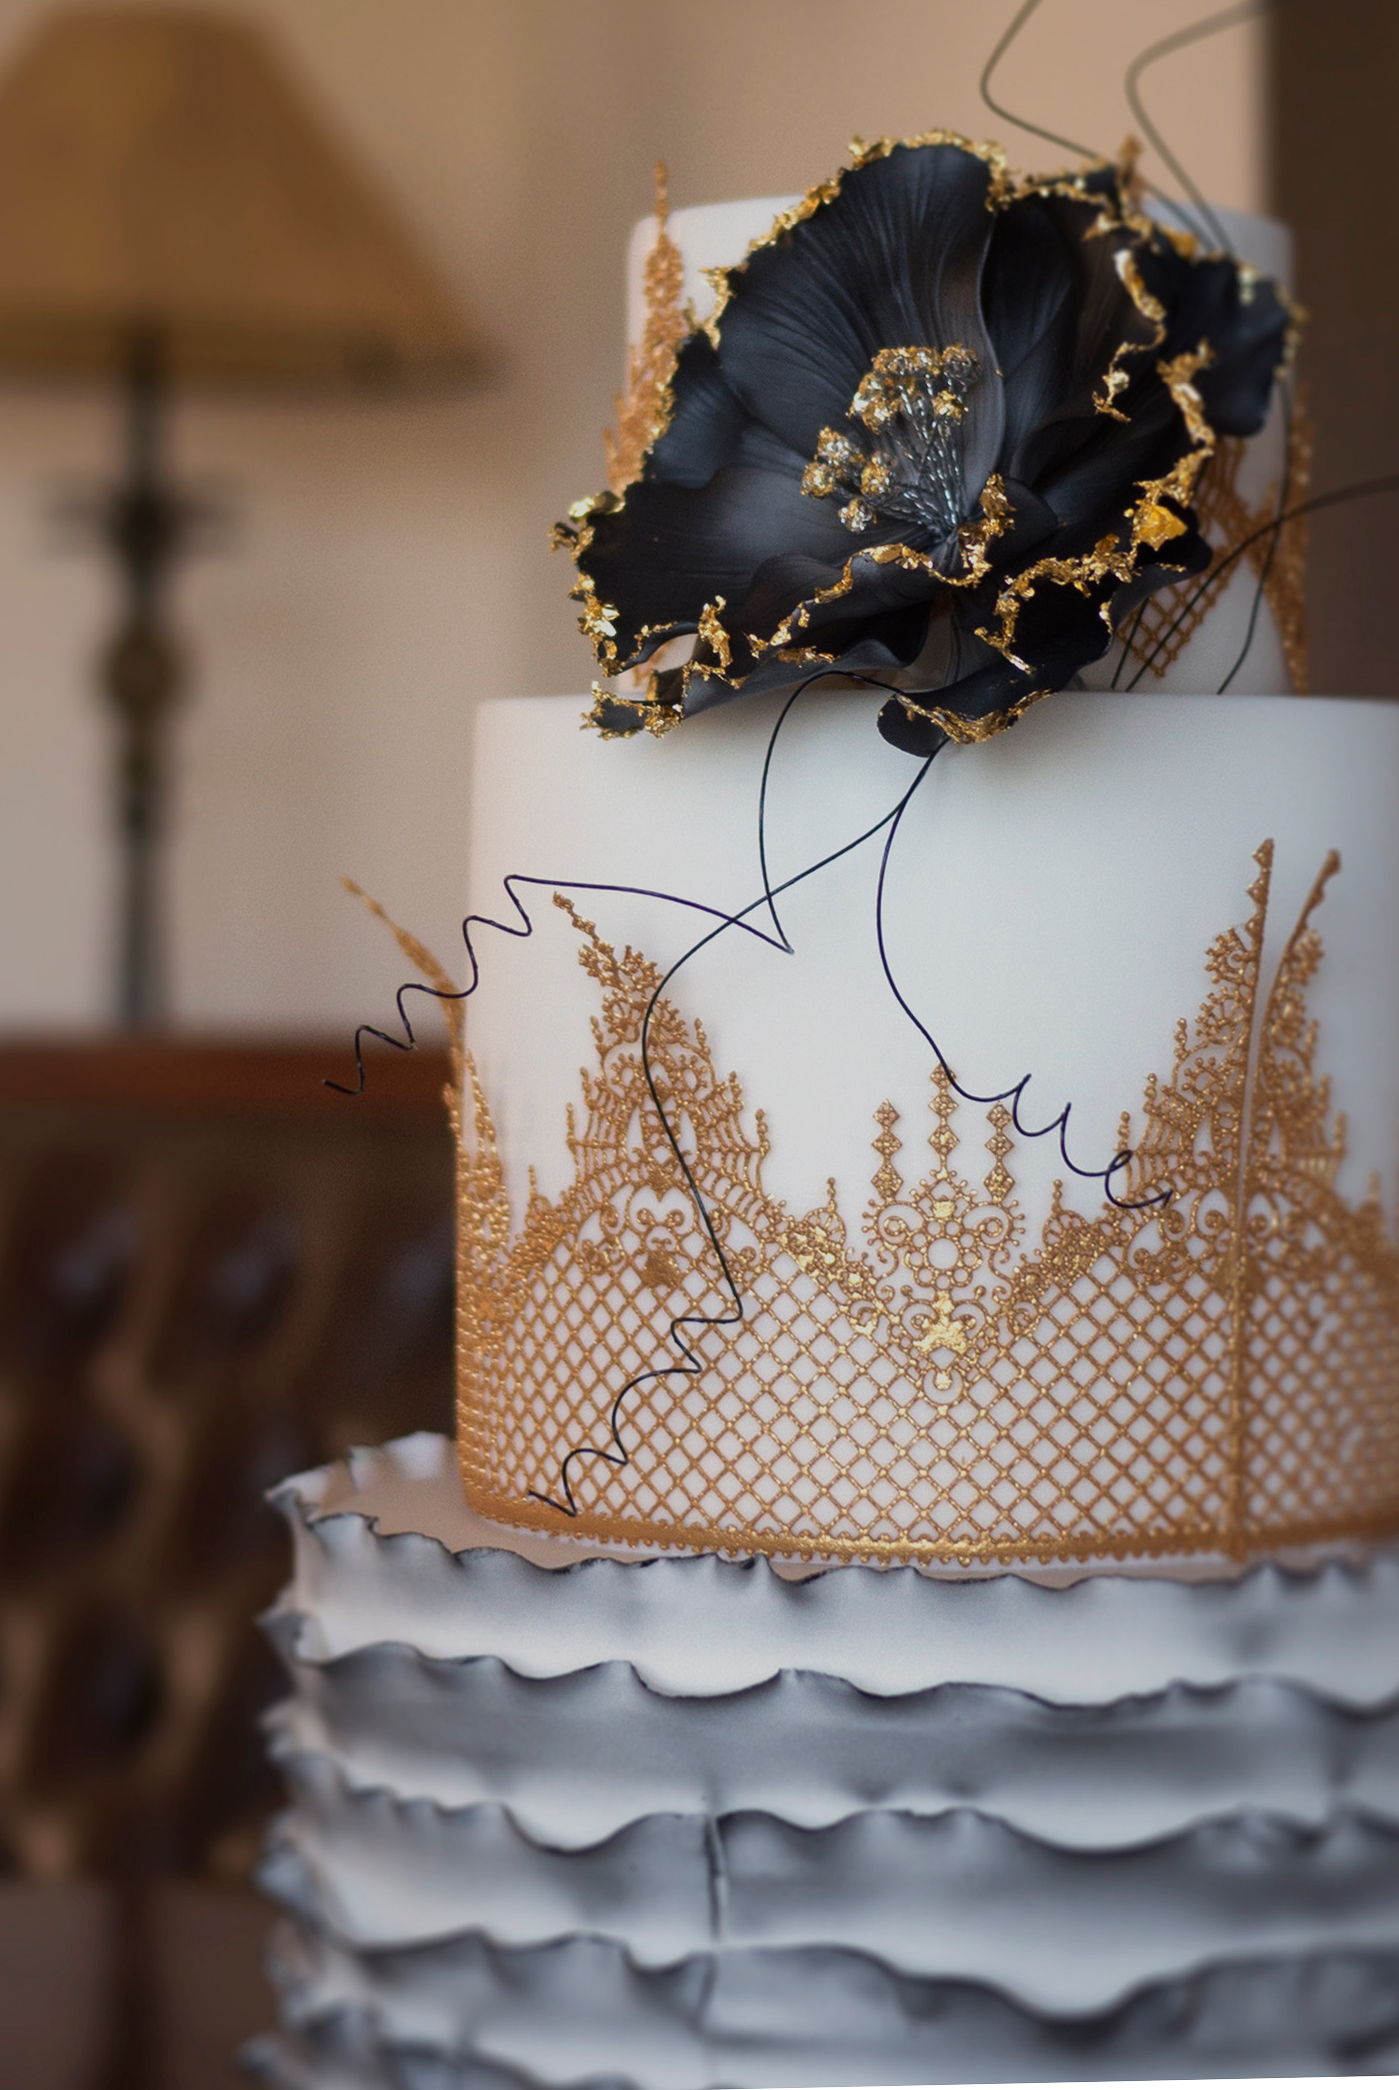 Gothic-Lace-Vintage-Cake-Close-Up2